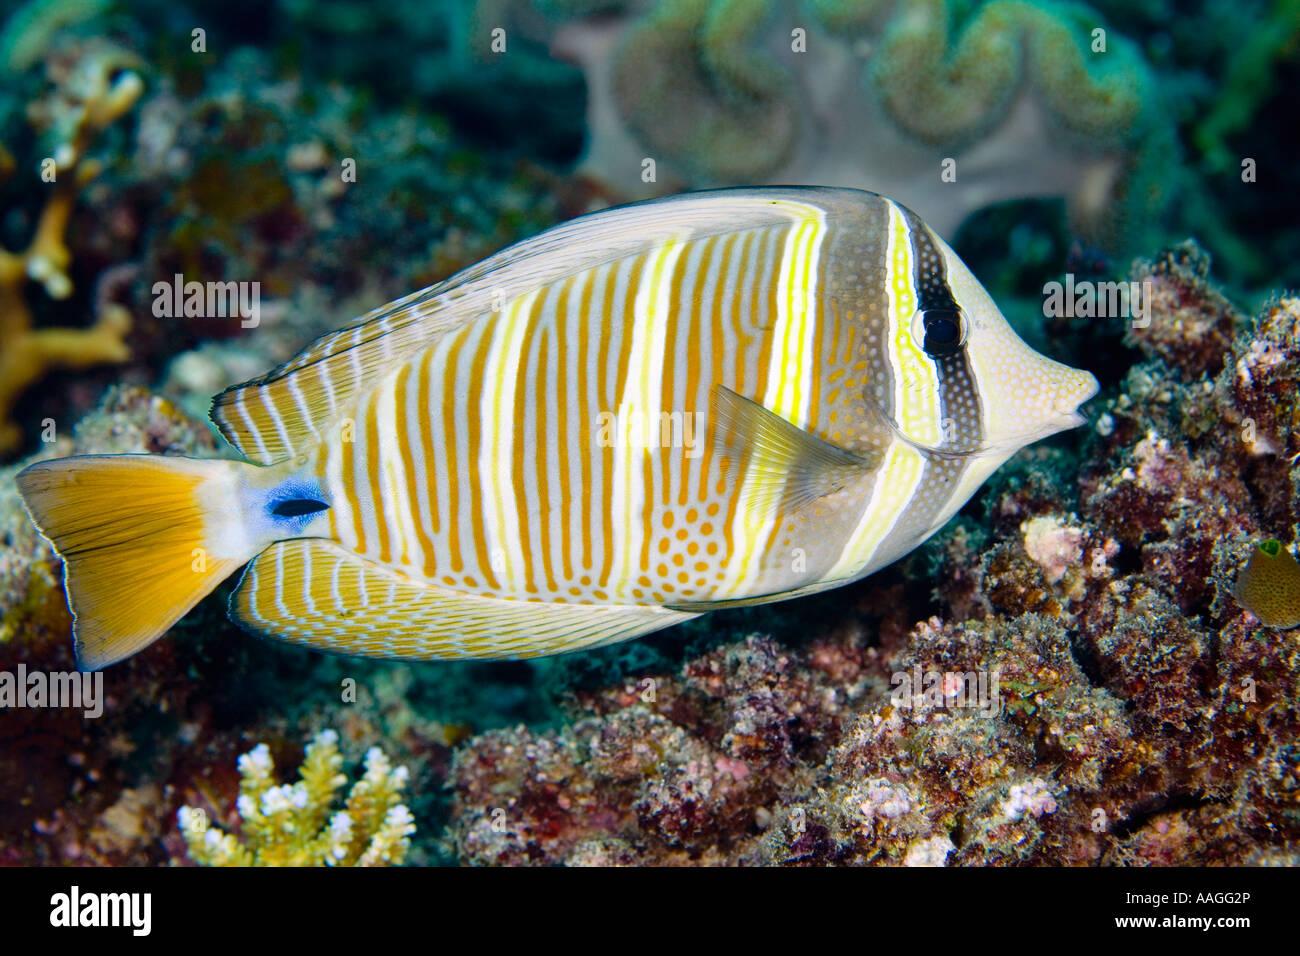 sailfin-surgeonfish-or-sailfin-tang-zebrasoma-veliferum-AAGG2P.jpg